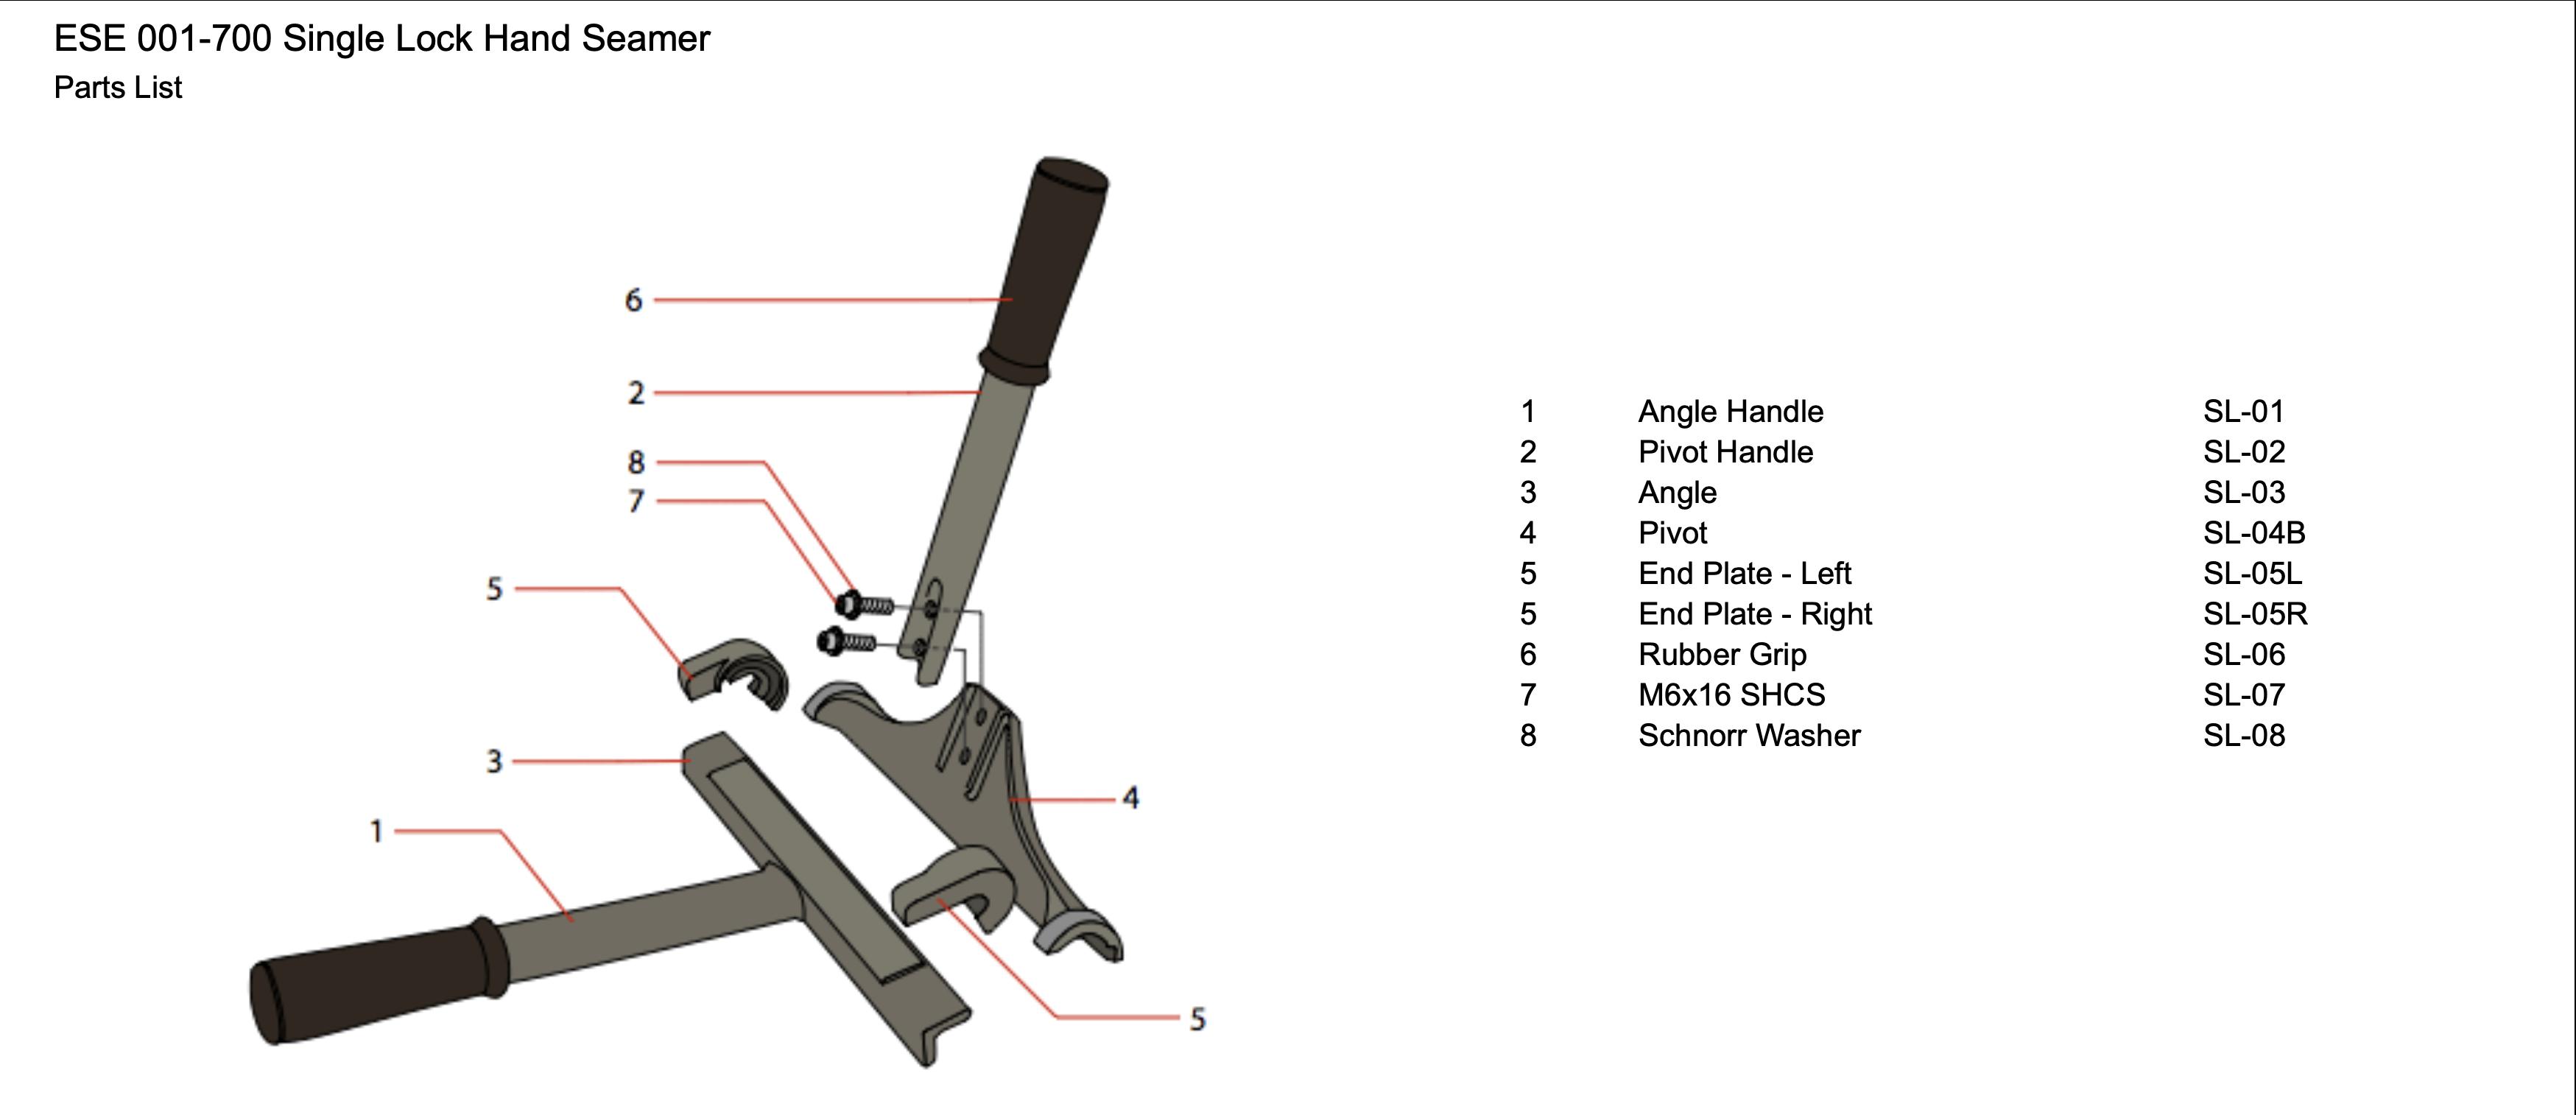 ese-001-700-single-lock-hand-seamer